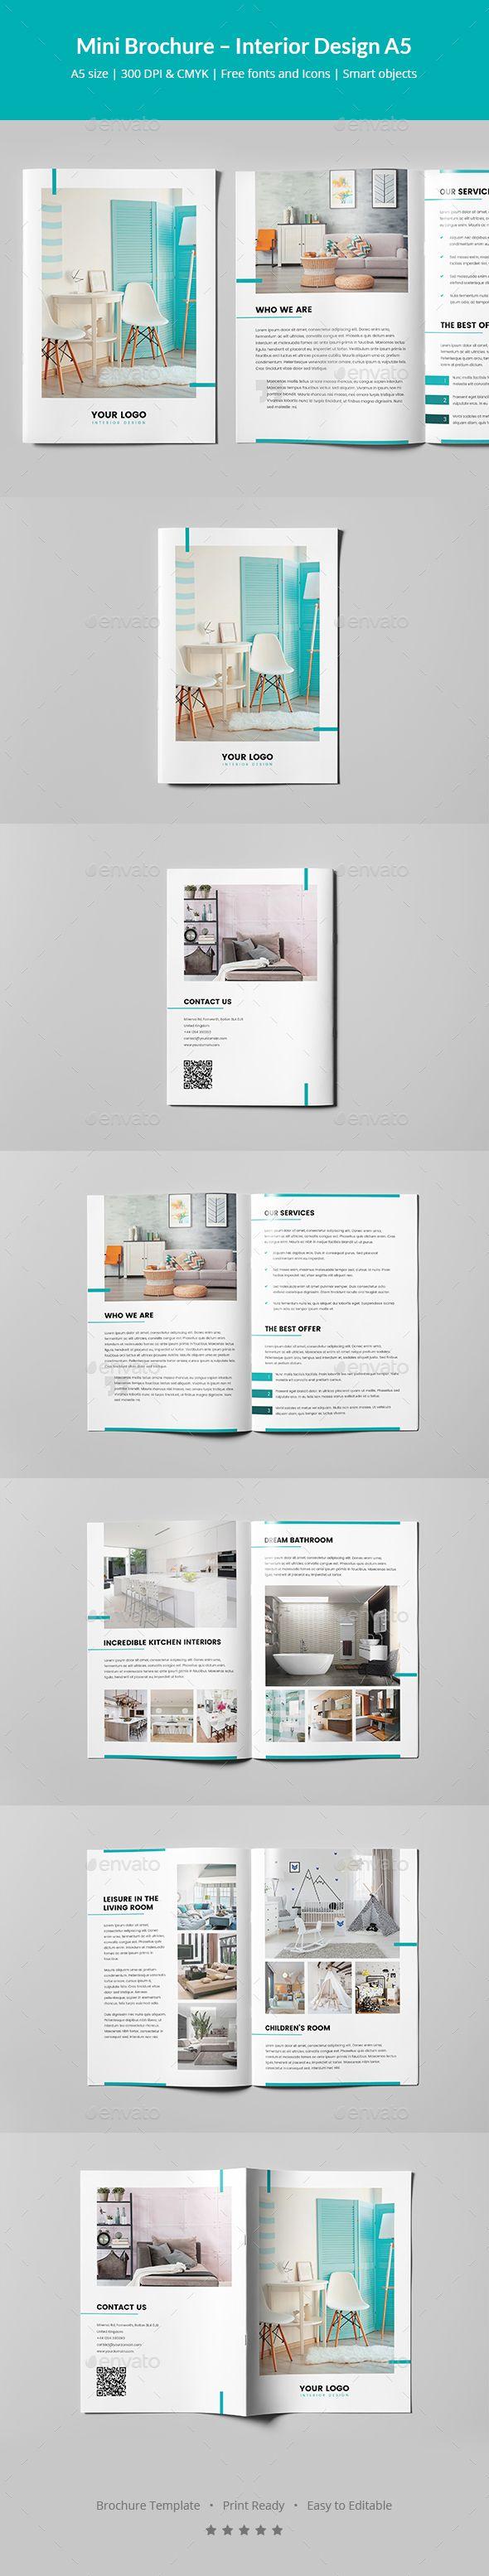 Mini Brochure Interior Design A Pinterest Brochures Brochure - Mini brochure template